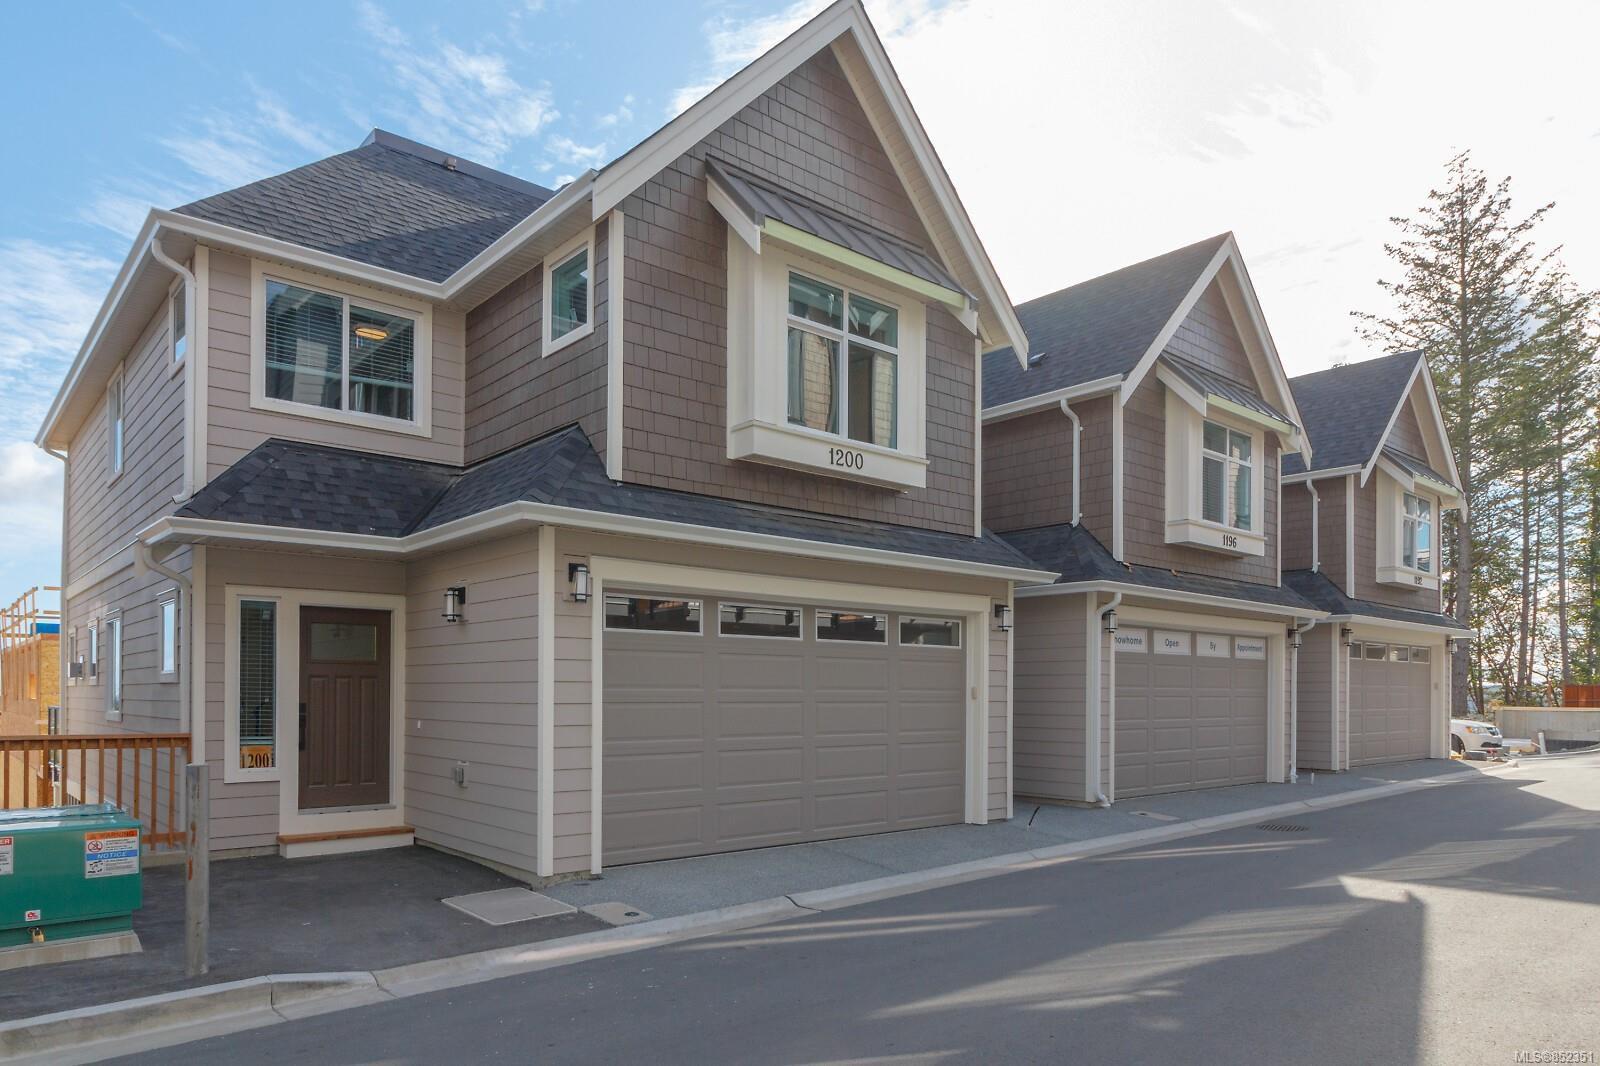 Main Photo: 1208 Moonstone Loop in : La Bear Mountain Row/Townhouse for sale (Langford)  : MLS®# 852351